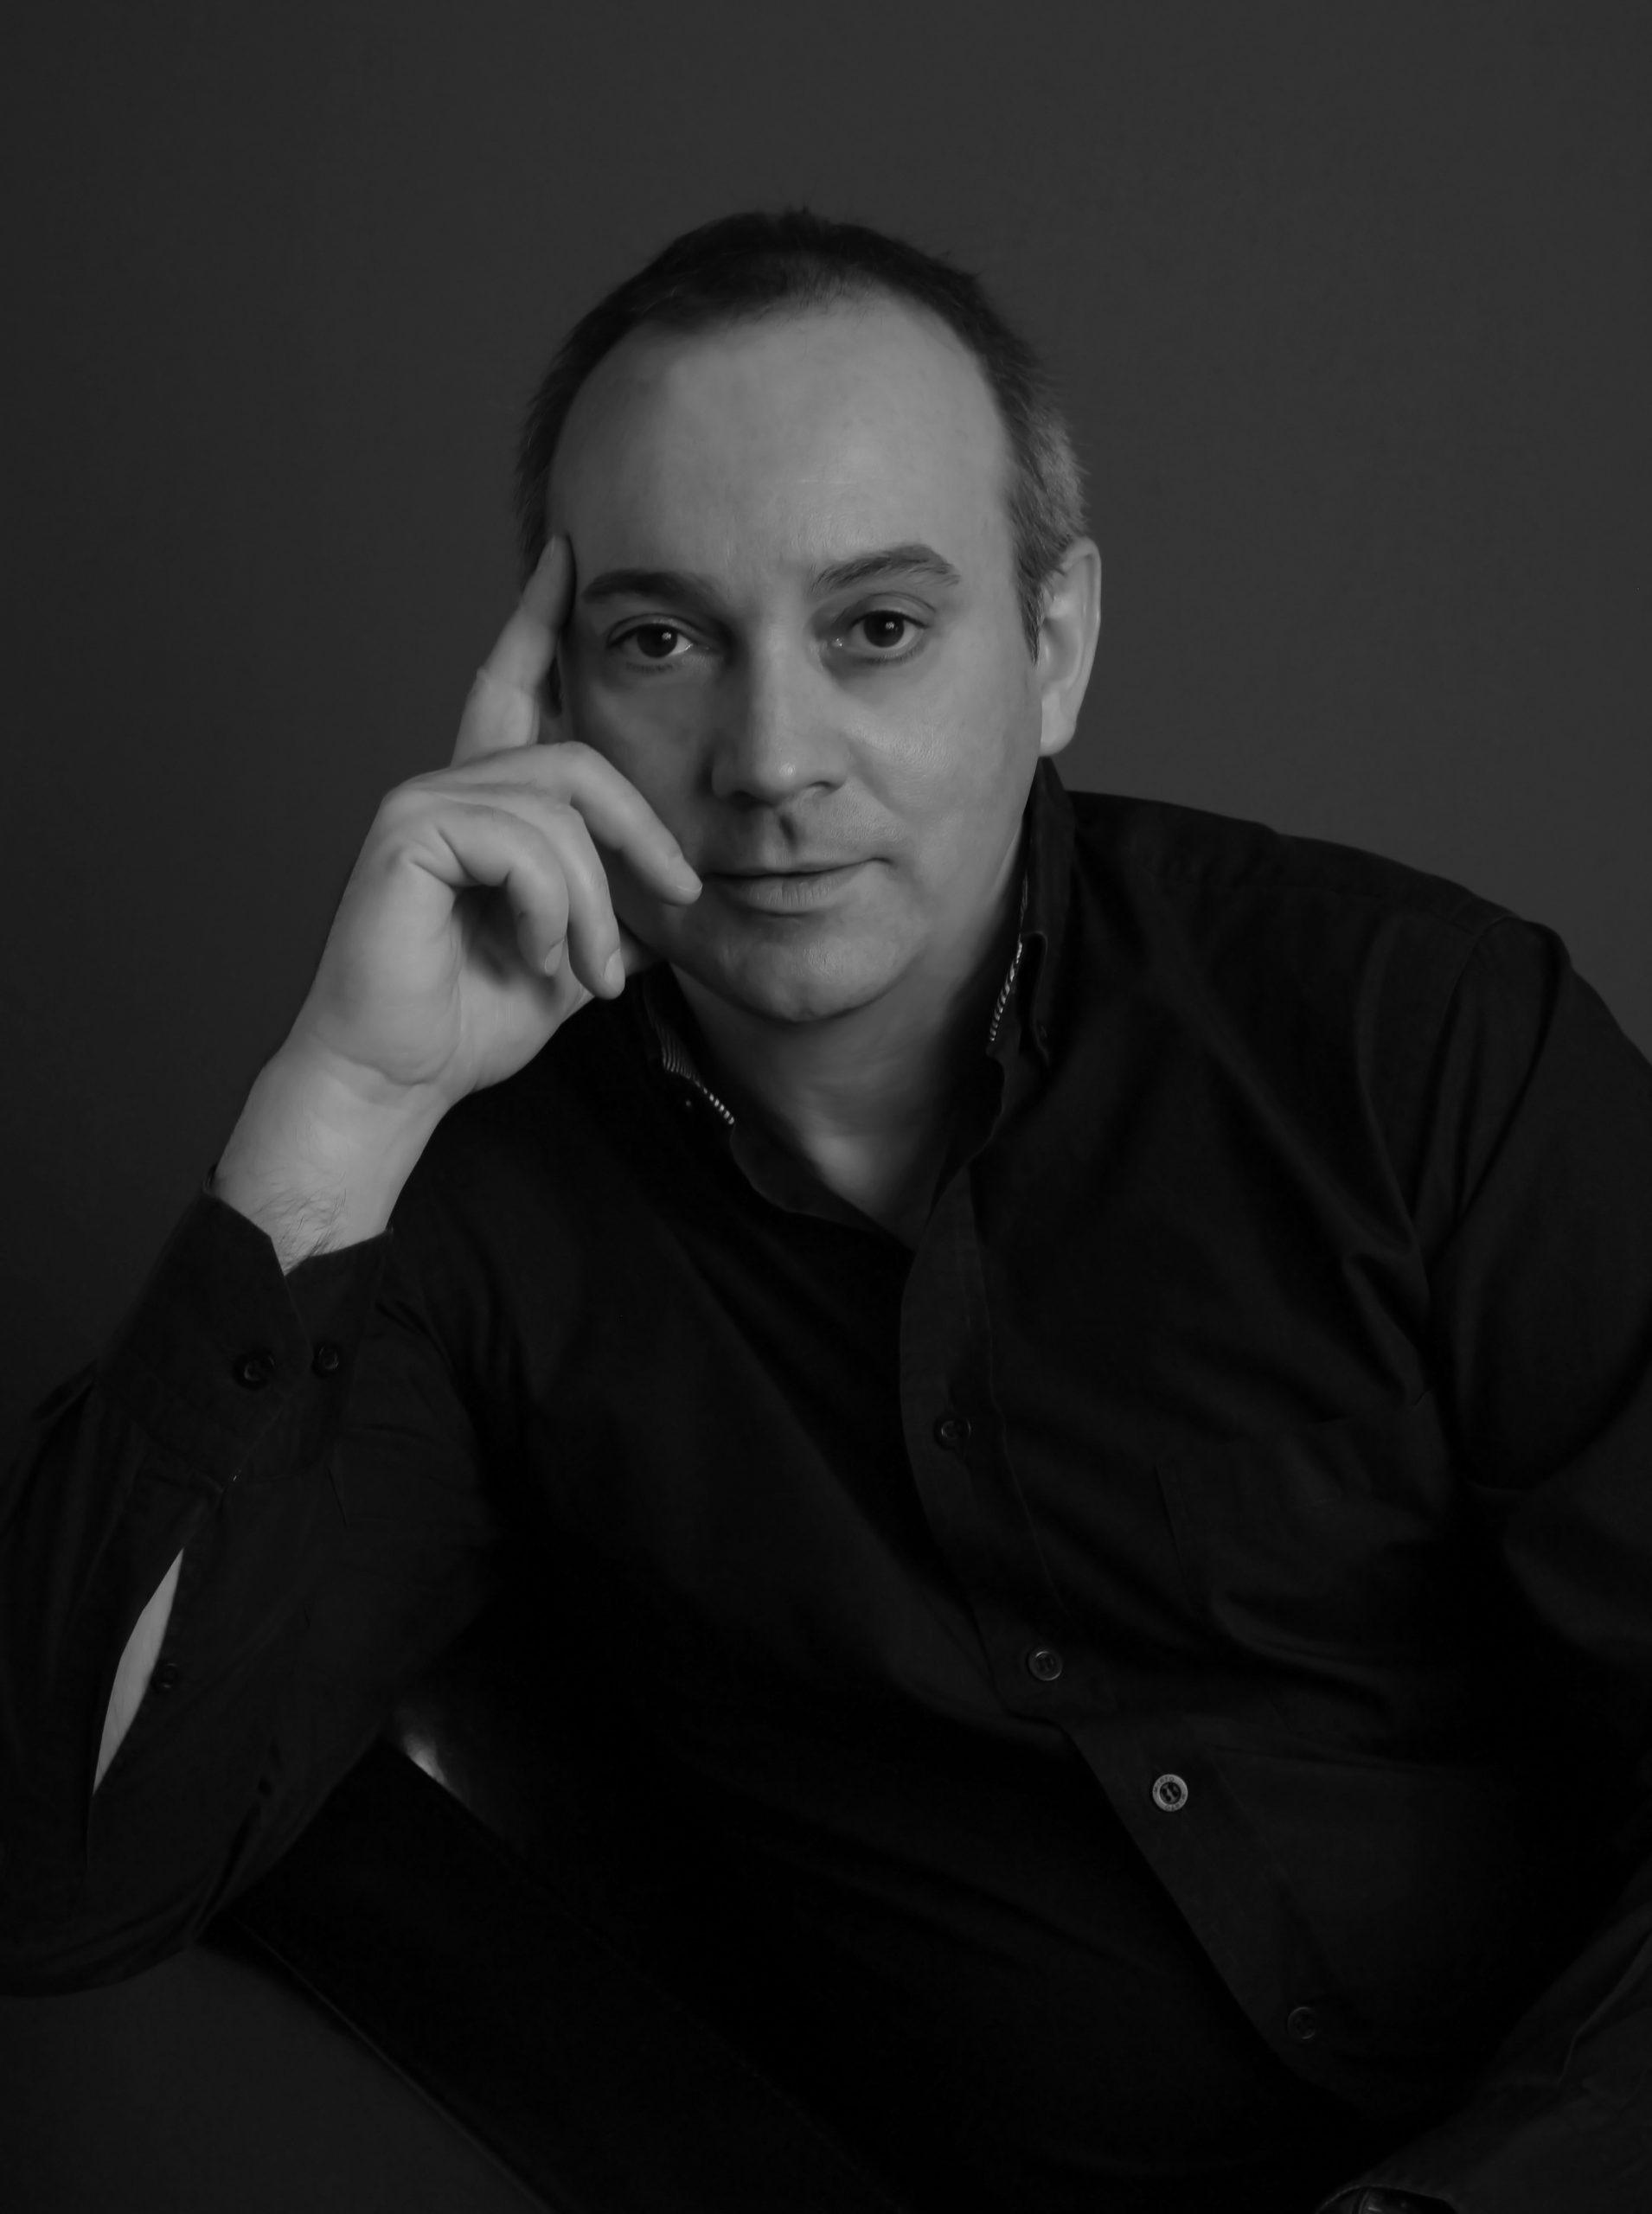 Javier Bahon